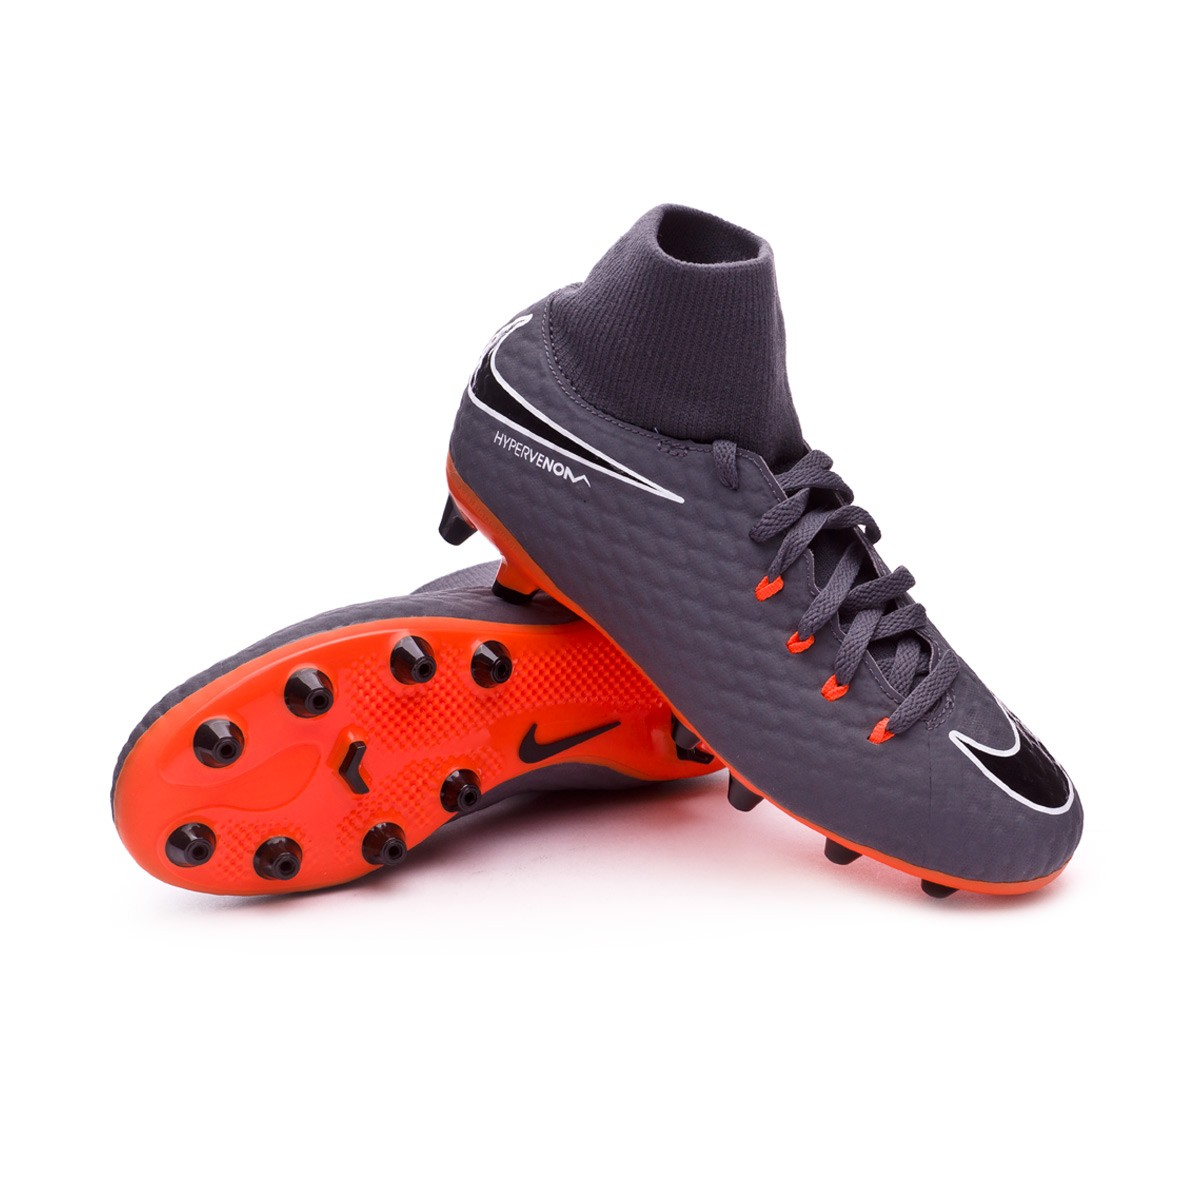 online store 1e502 c7fab Nike Hypervenom Phantom III Academy DF AG-Pro Kids Football Boots